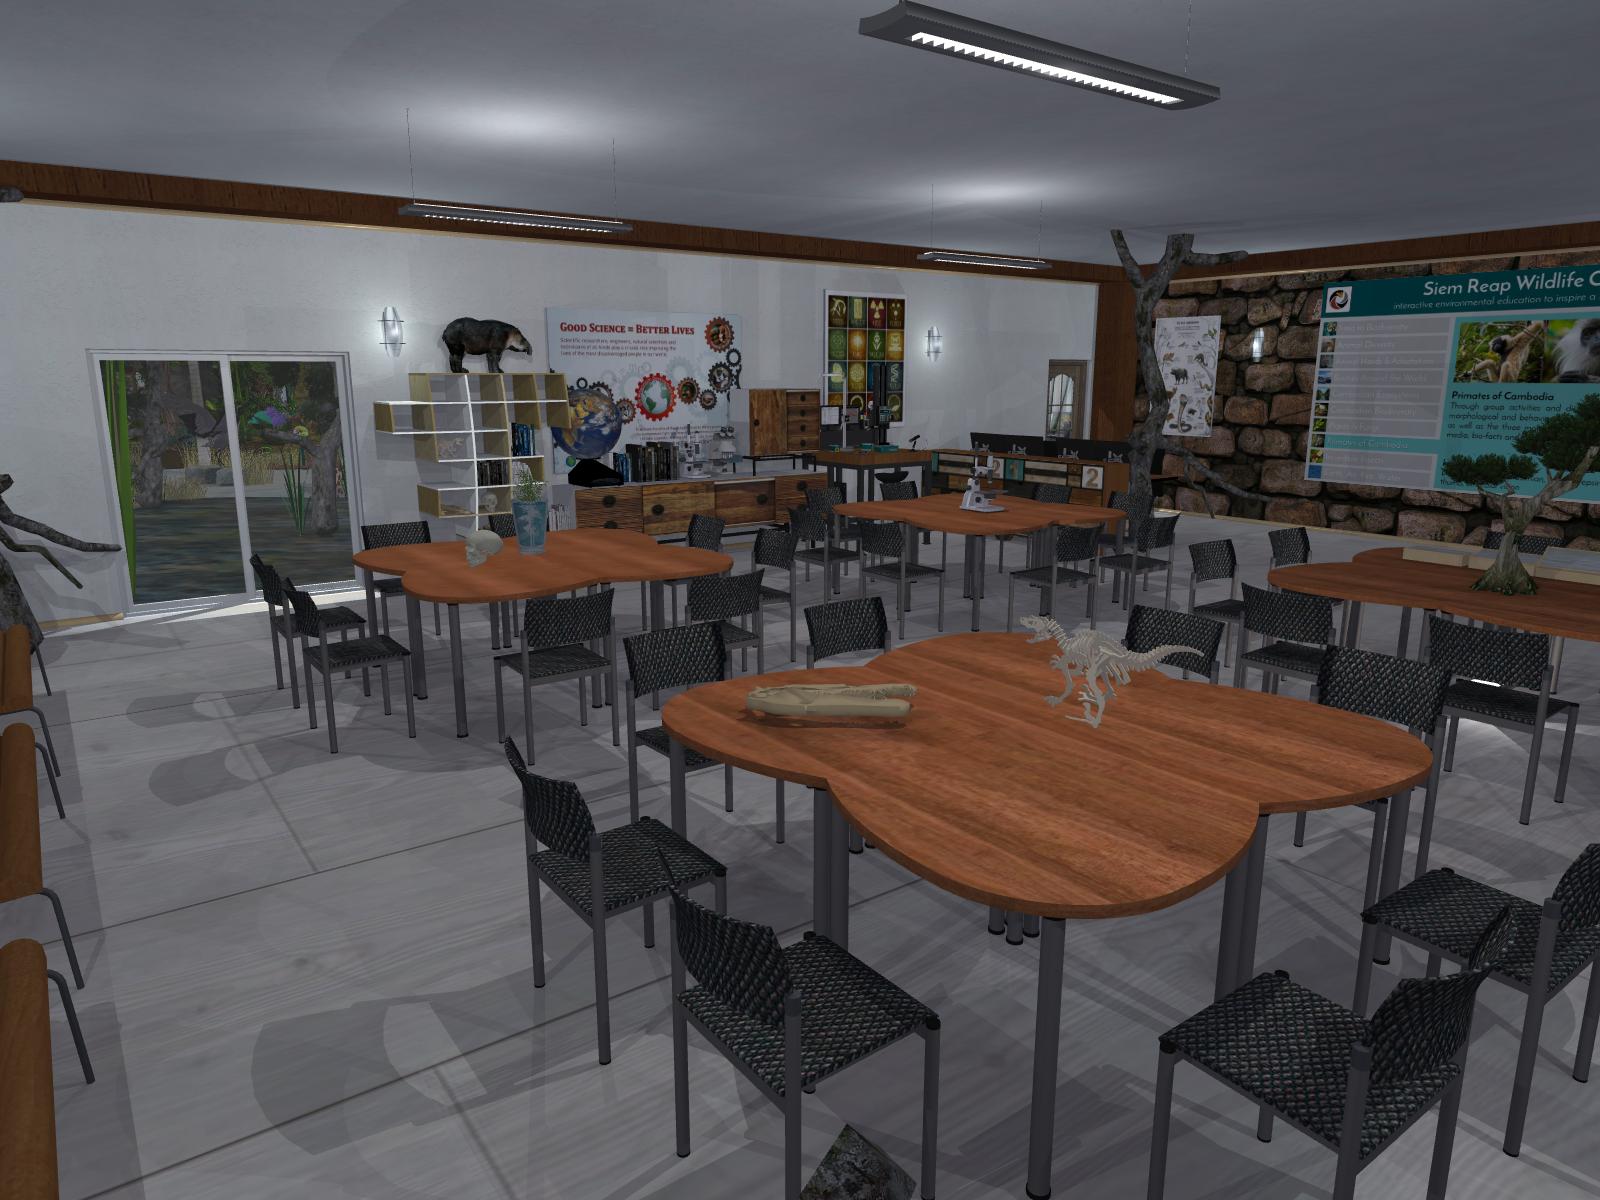 Wildlife Science Classroom